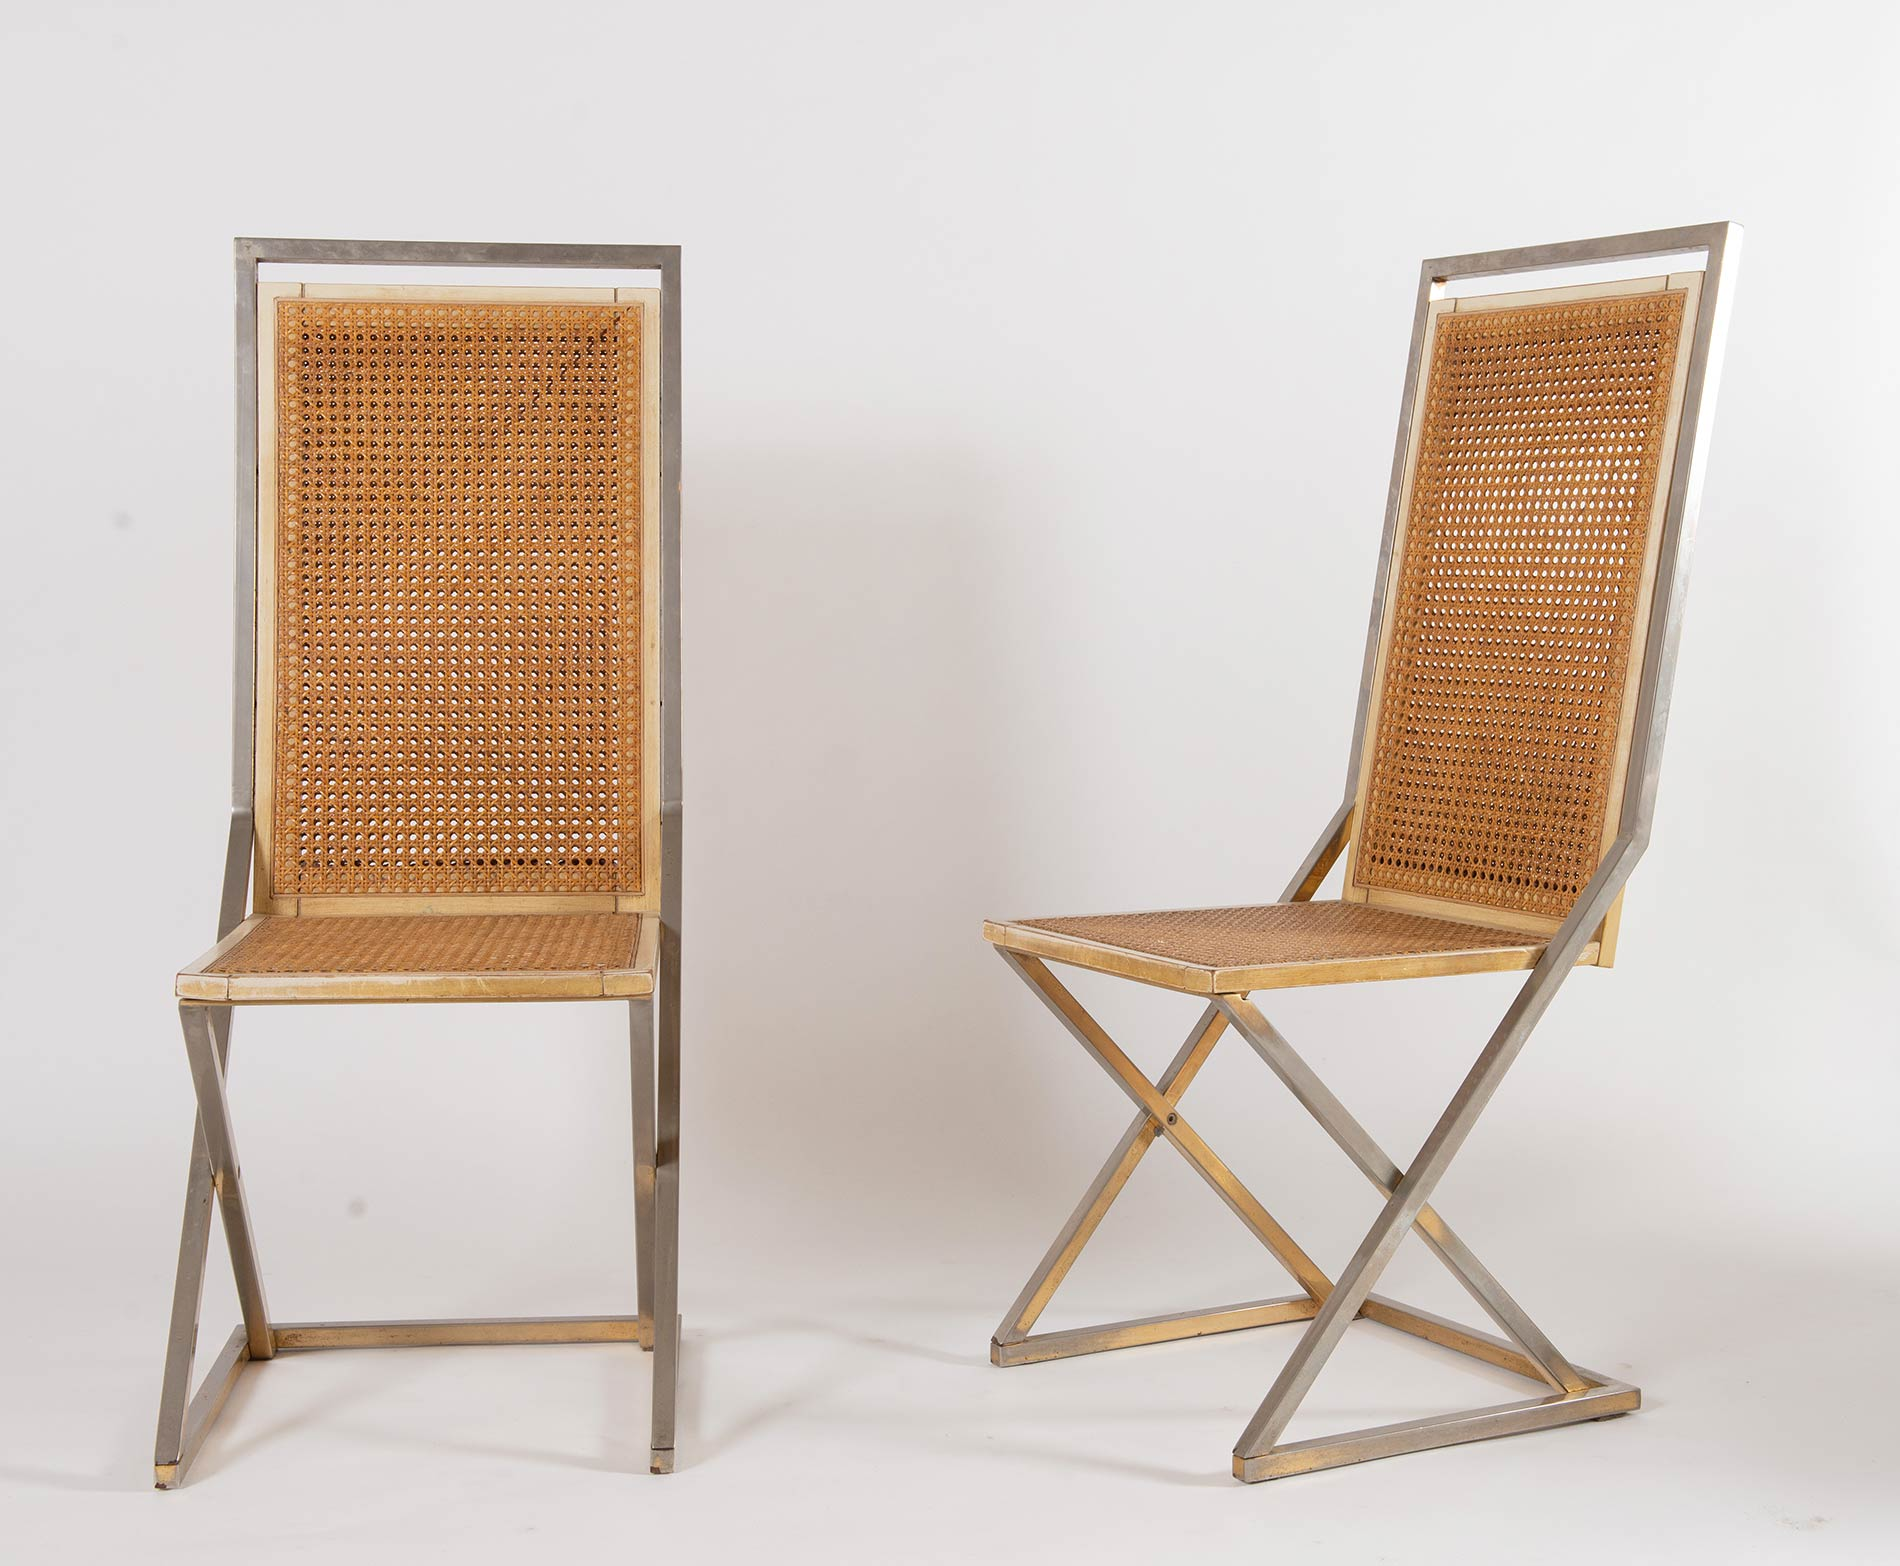 Fratelli Turri – Carugo, Sei sedie, Anni '70. - Image 3 of 4